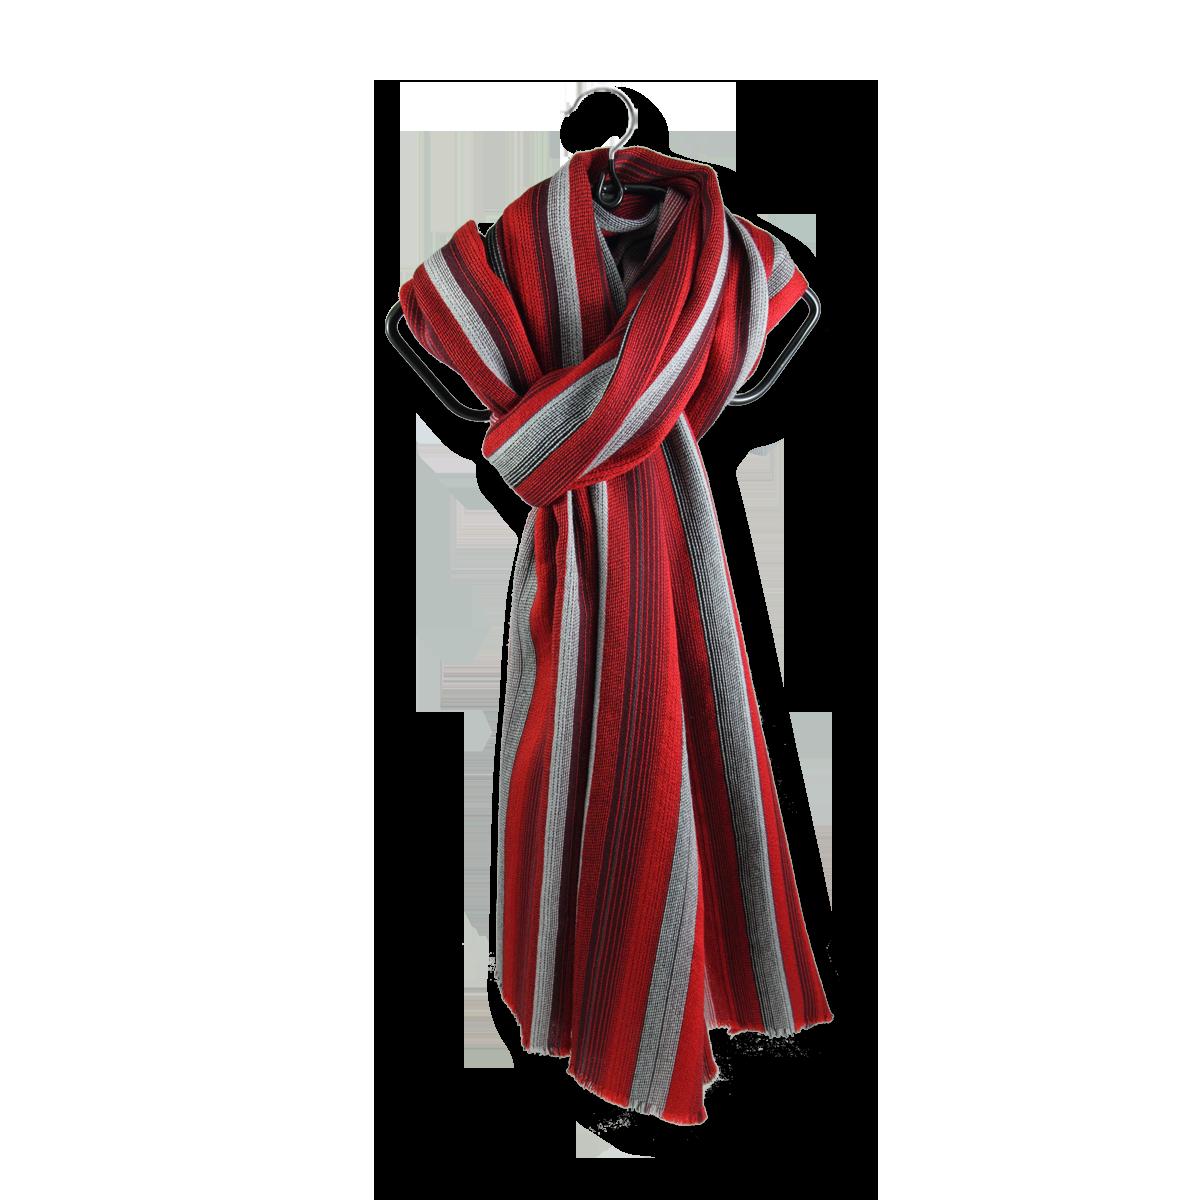 echarpe rayures verticales echarpe homme en laine soie. Black Bedroom Furniture Sets. Home Design Ideas